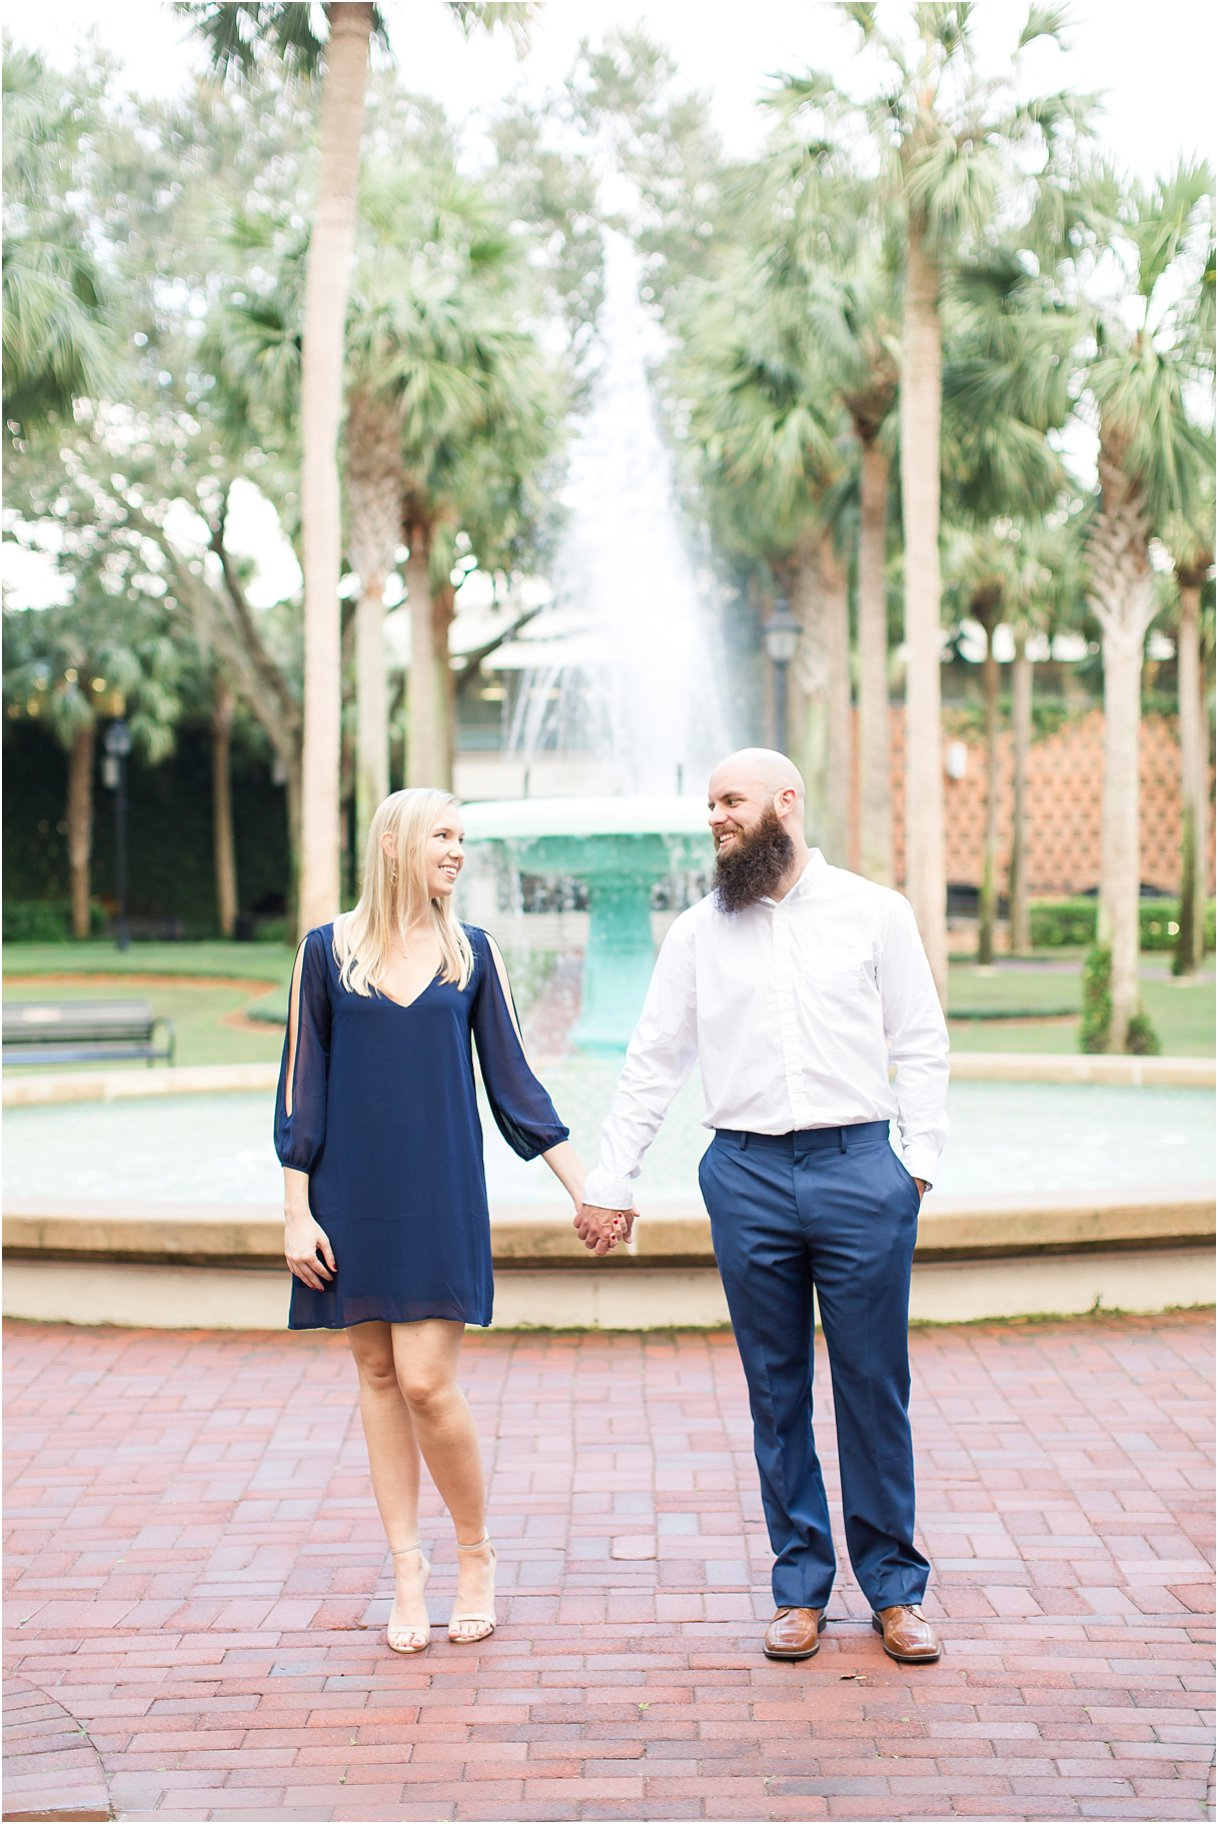 Stetson Florida Engagement Session Tampa St Augustine DeLand11.jpg